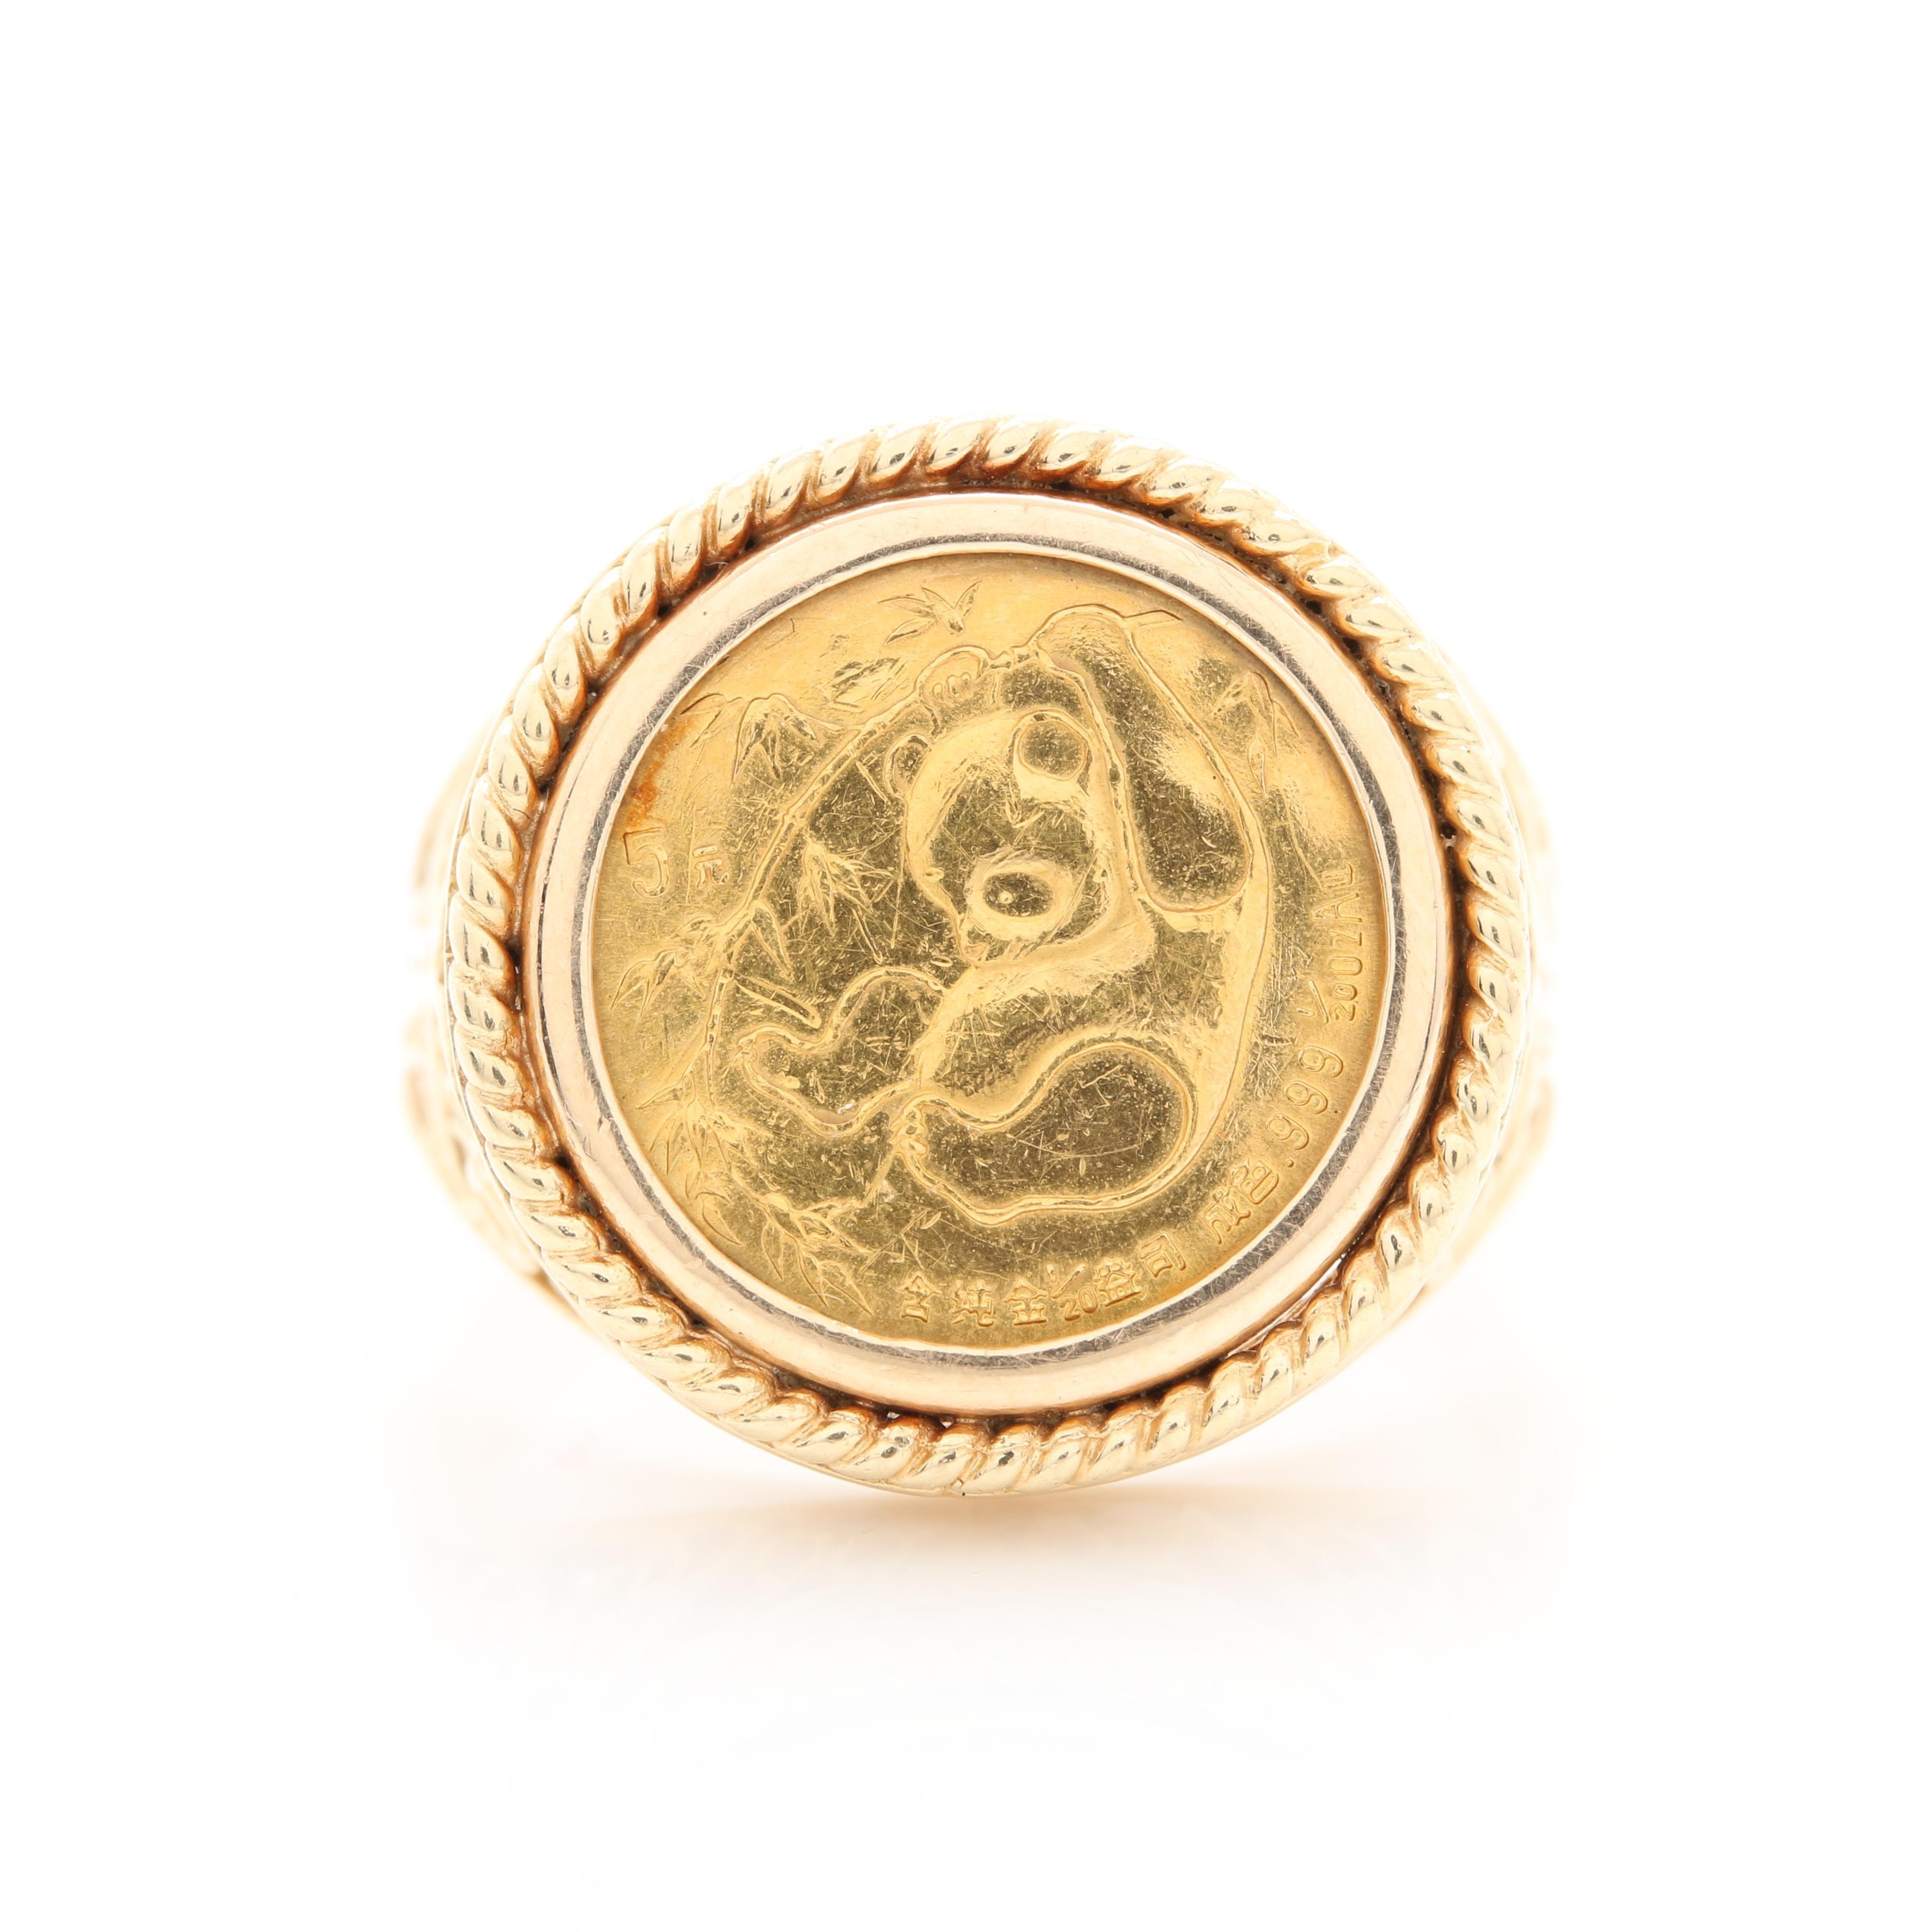 14K and 22K Yellow Gold Chinese Panda Coin Ring